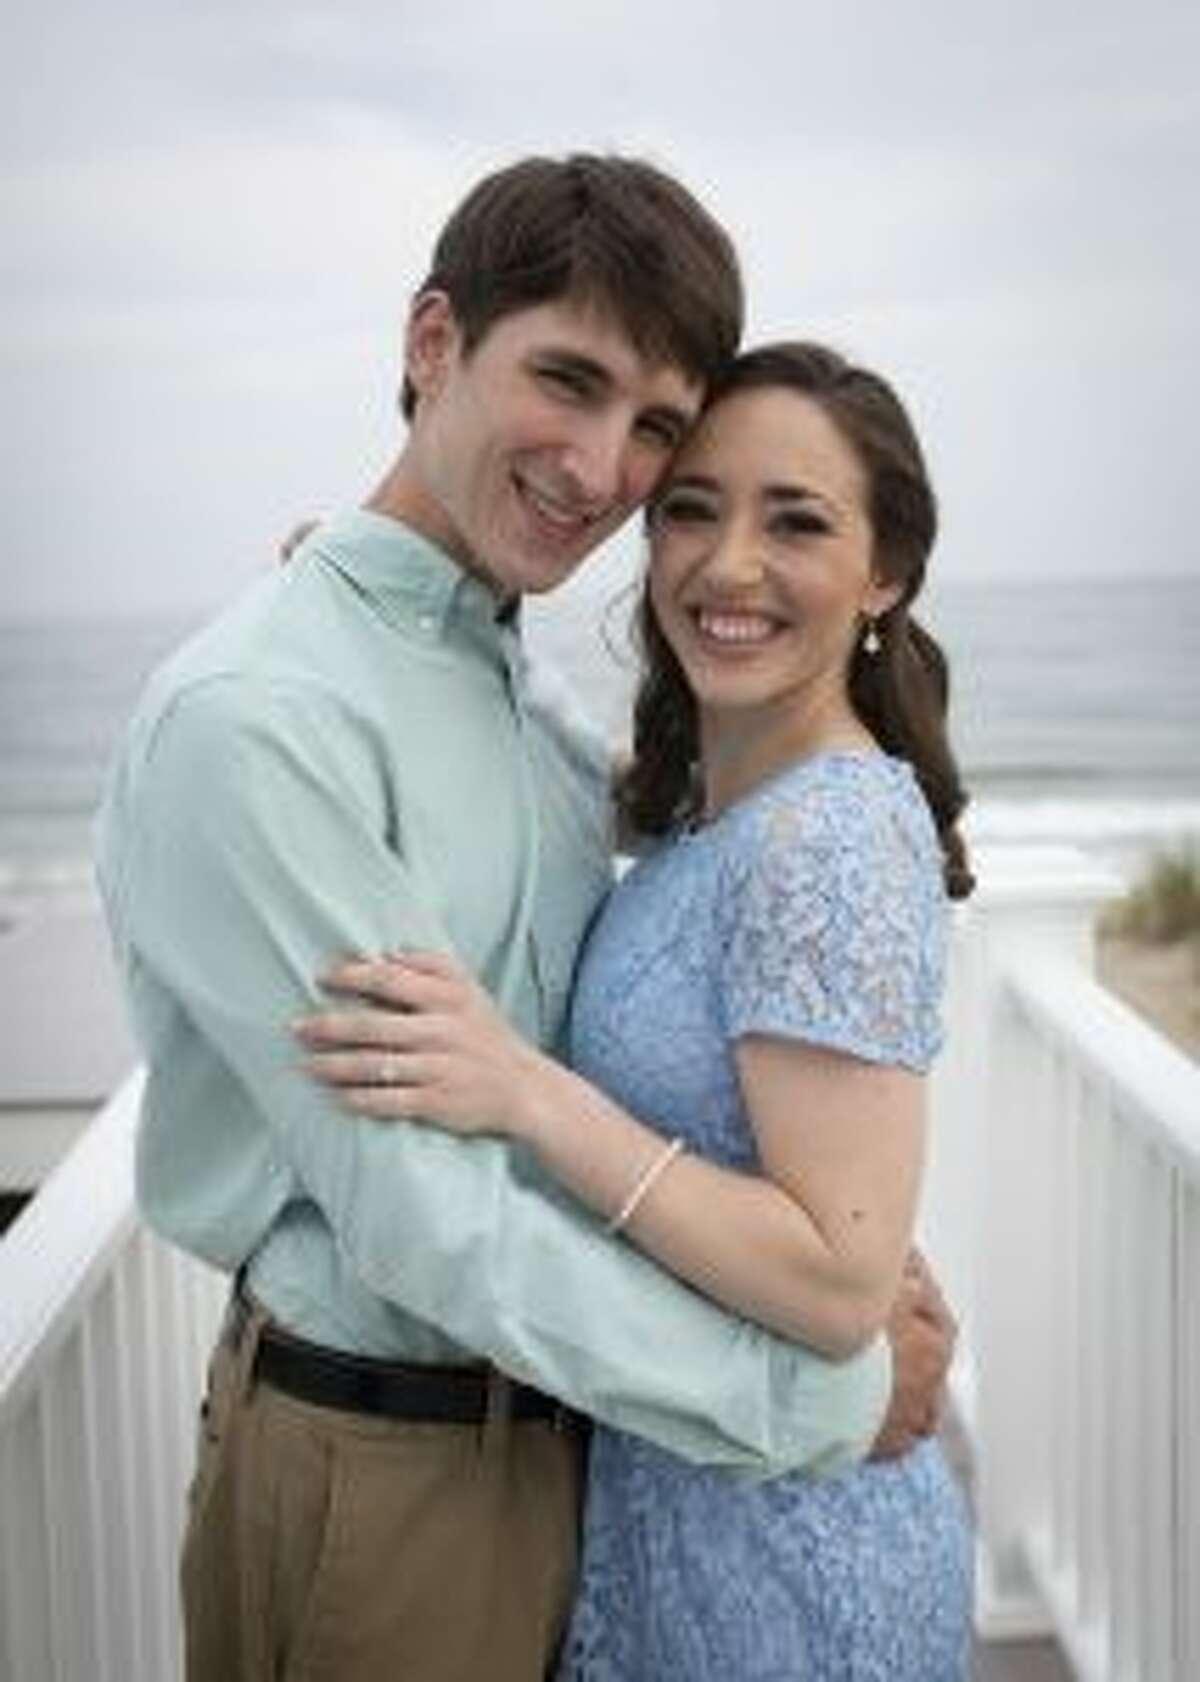 Nicholas Van Houten, Kristen Hogan